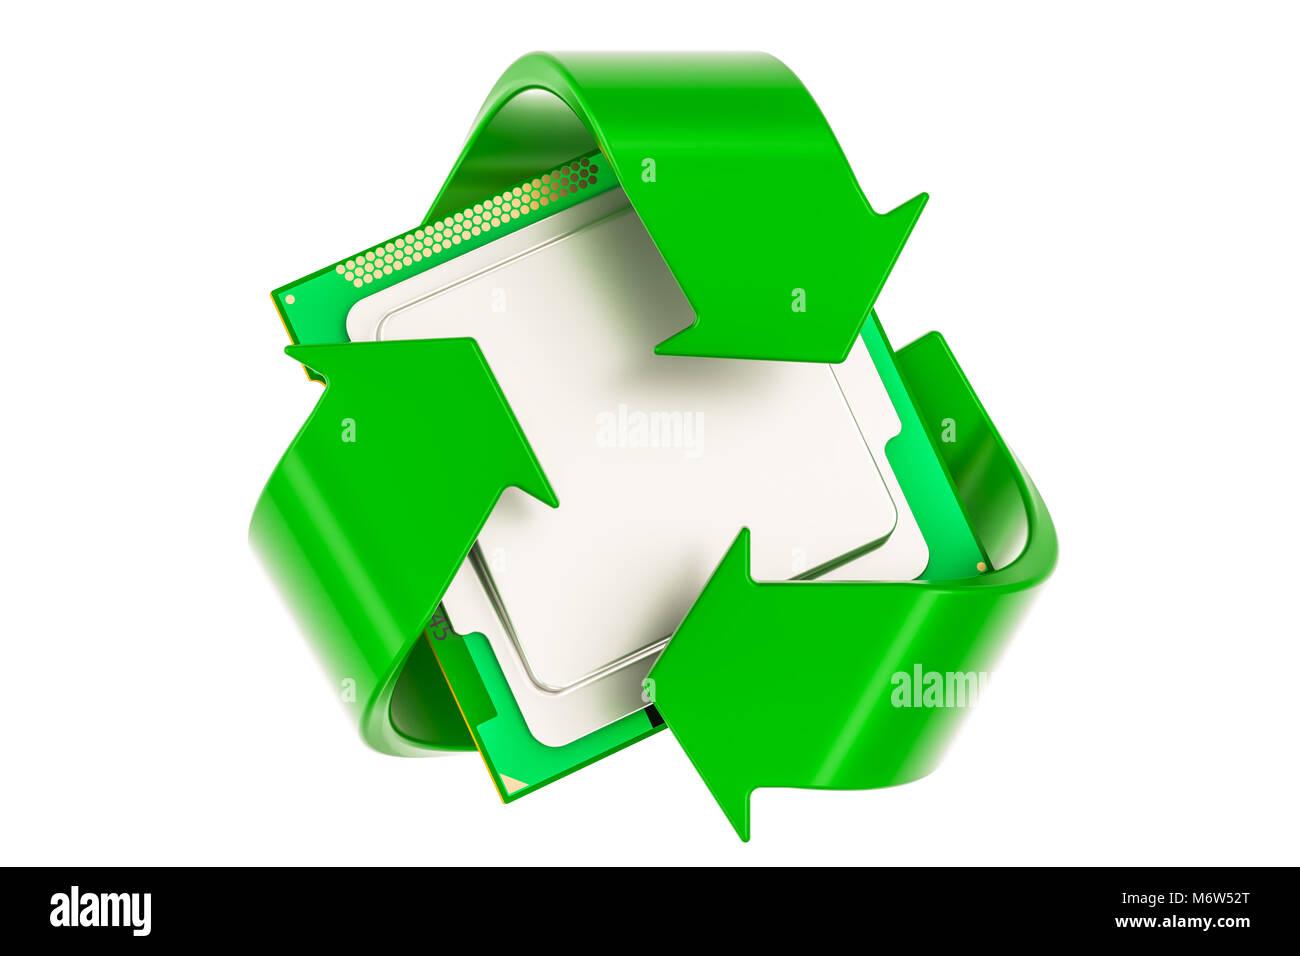 3d golden recycle symbol stock photos 3d golden recycle symbol green recycle symbol with cpu computer processor unit 3d rendering stock image buycottarizona Choice Image